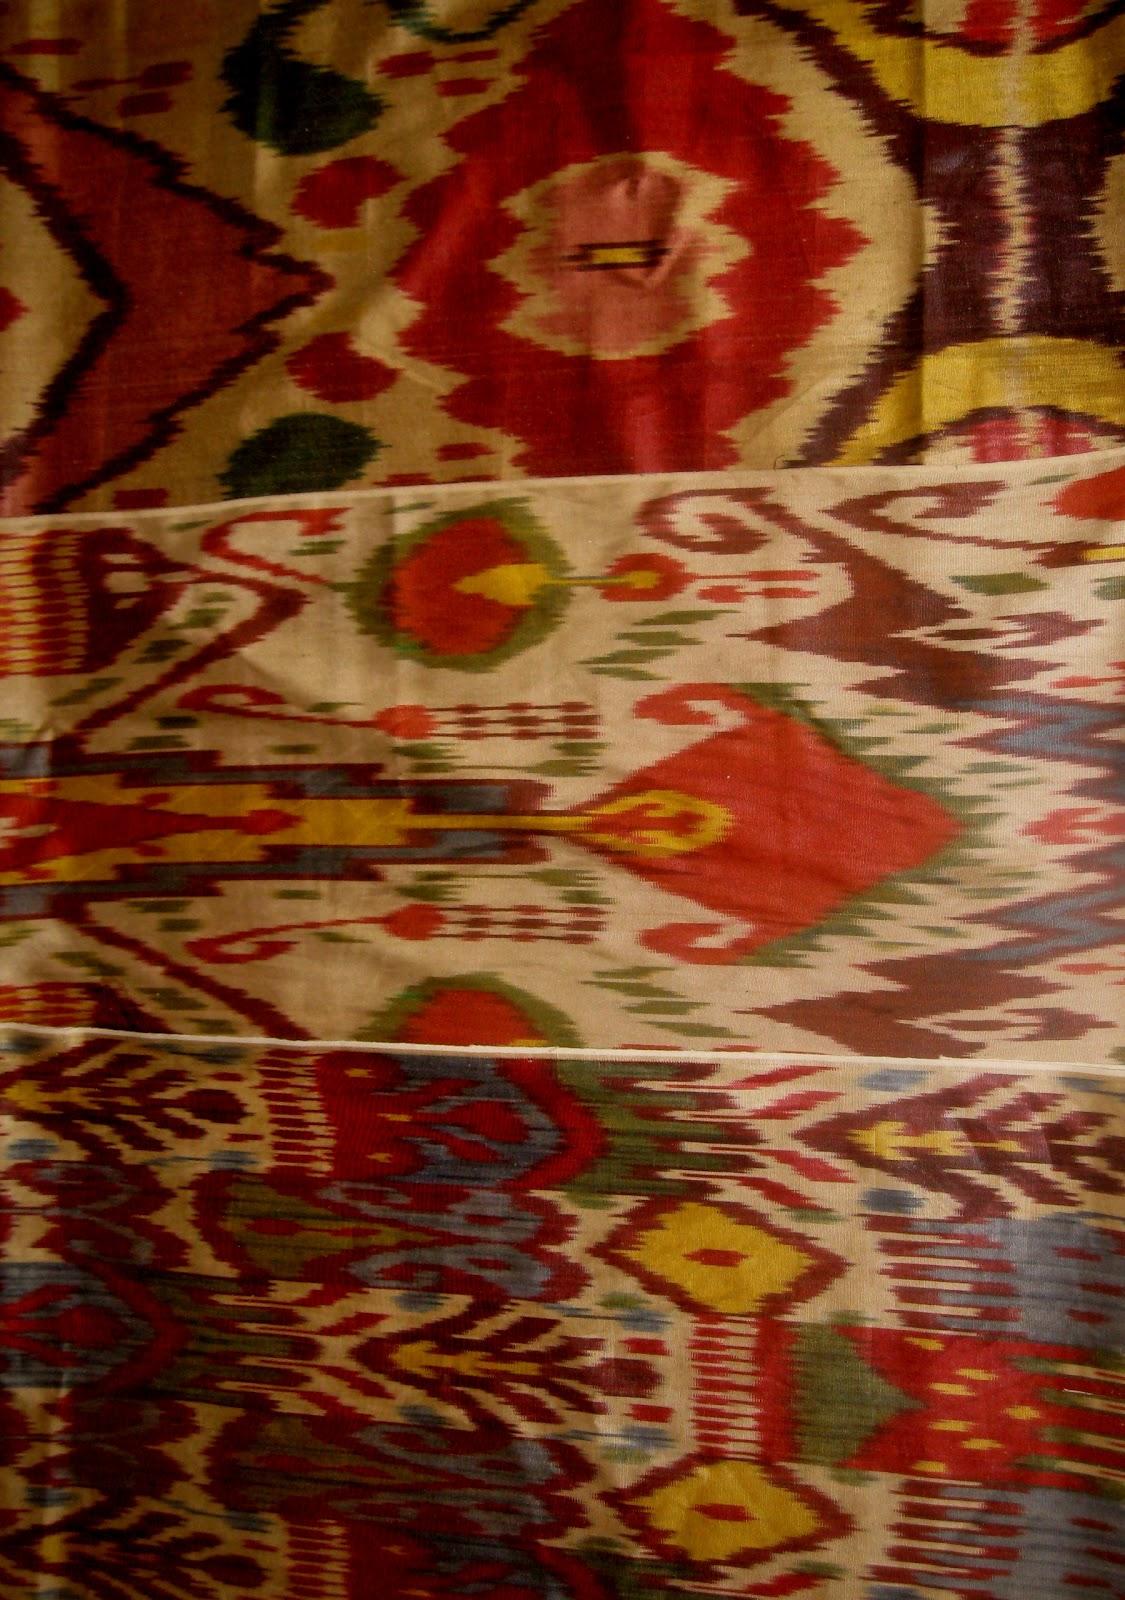 Haus Design A Turkish Bath Ikat Fabric And More